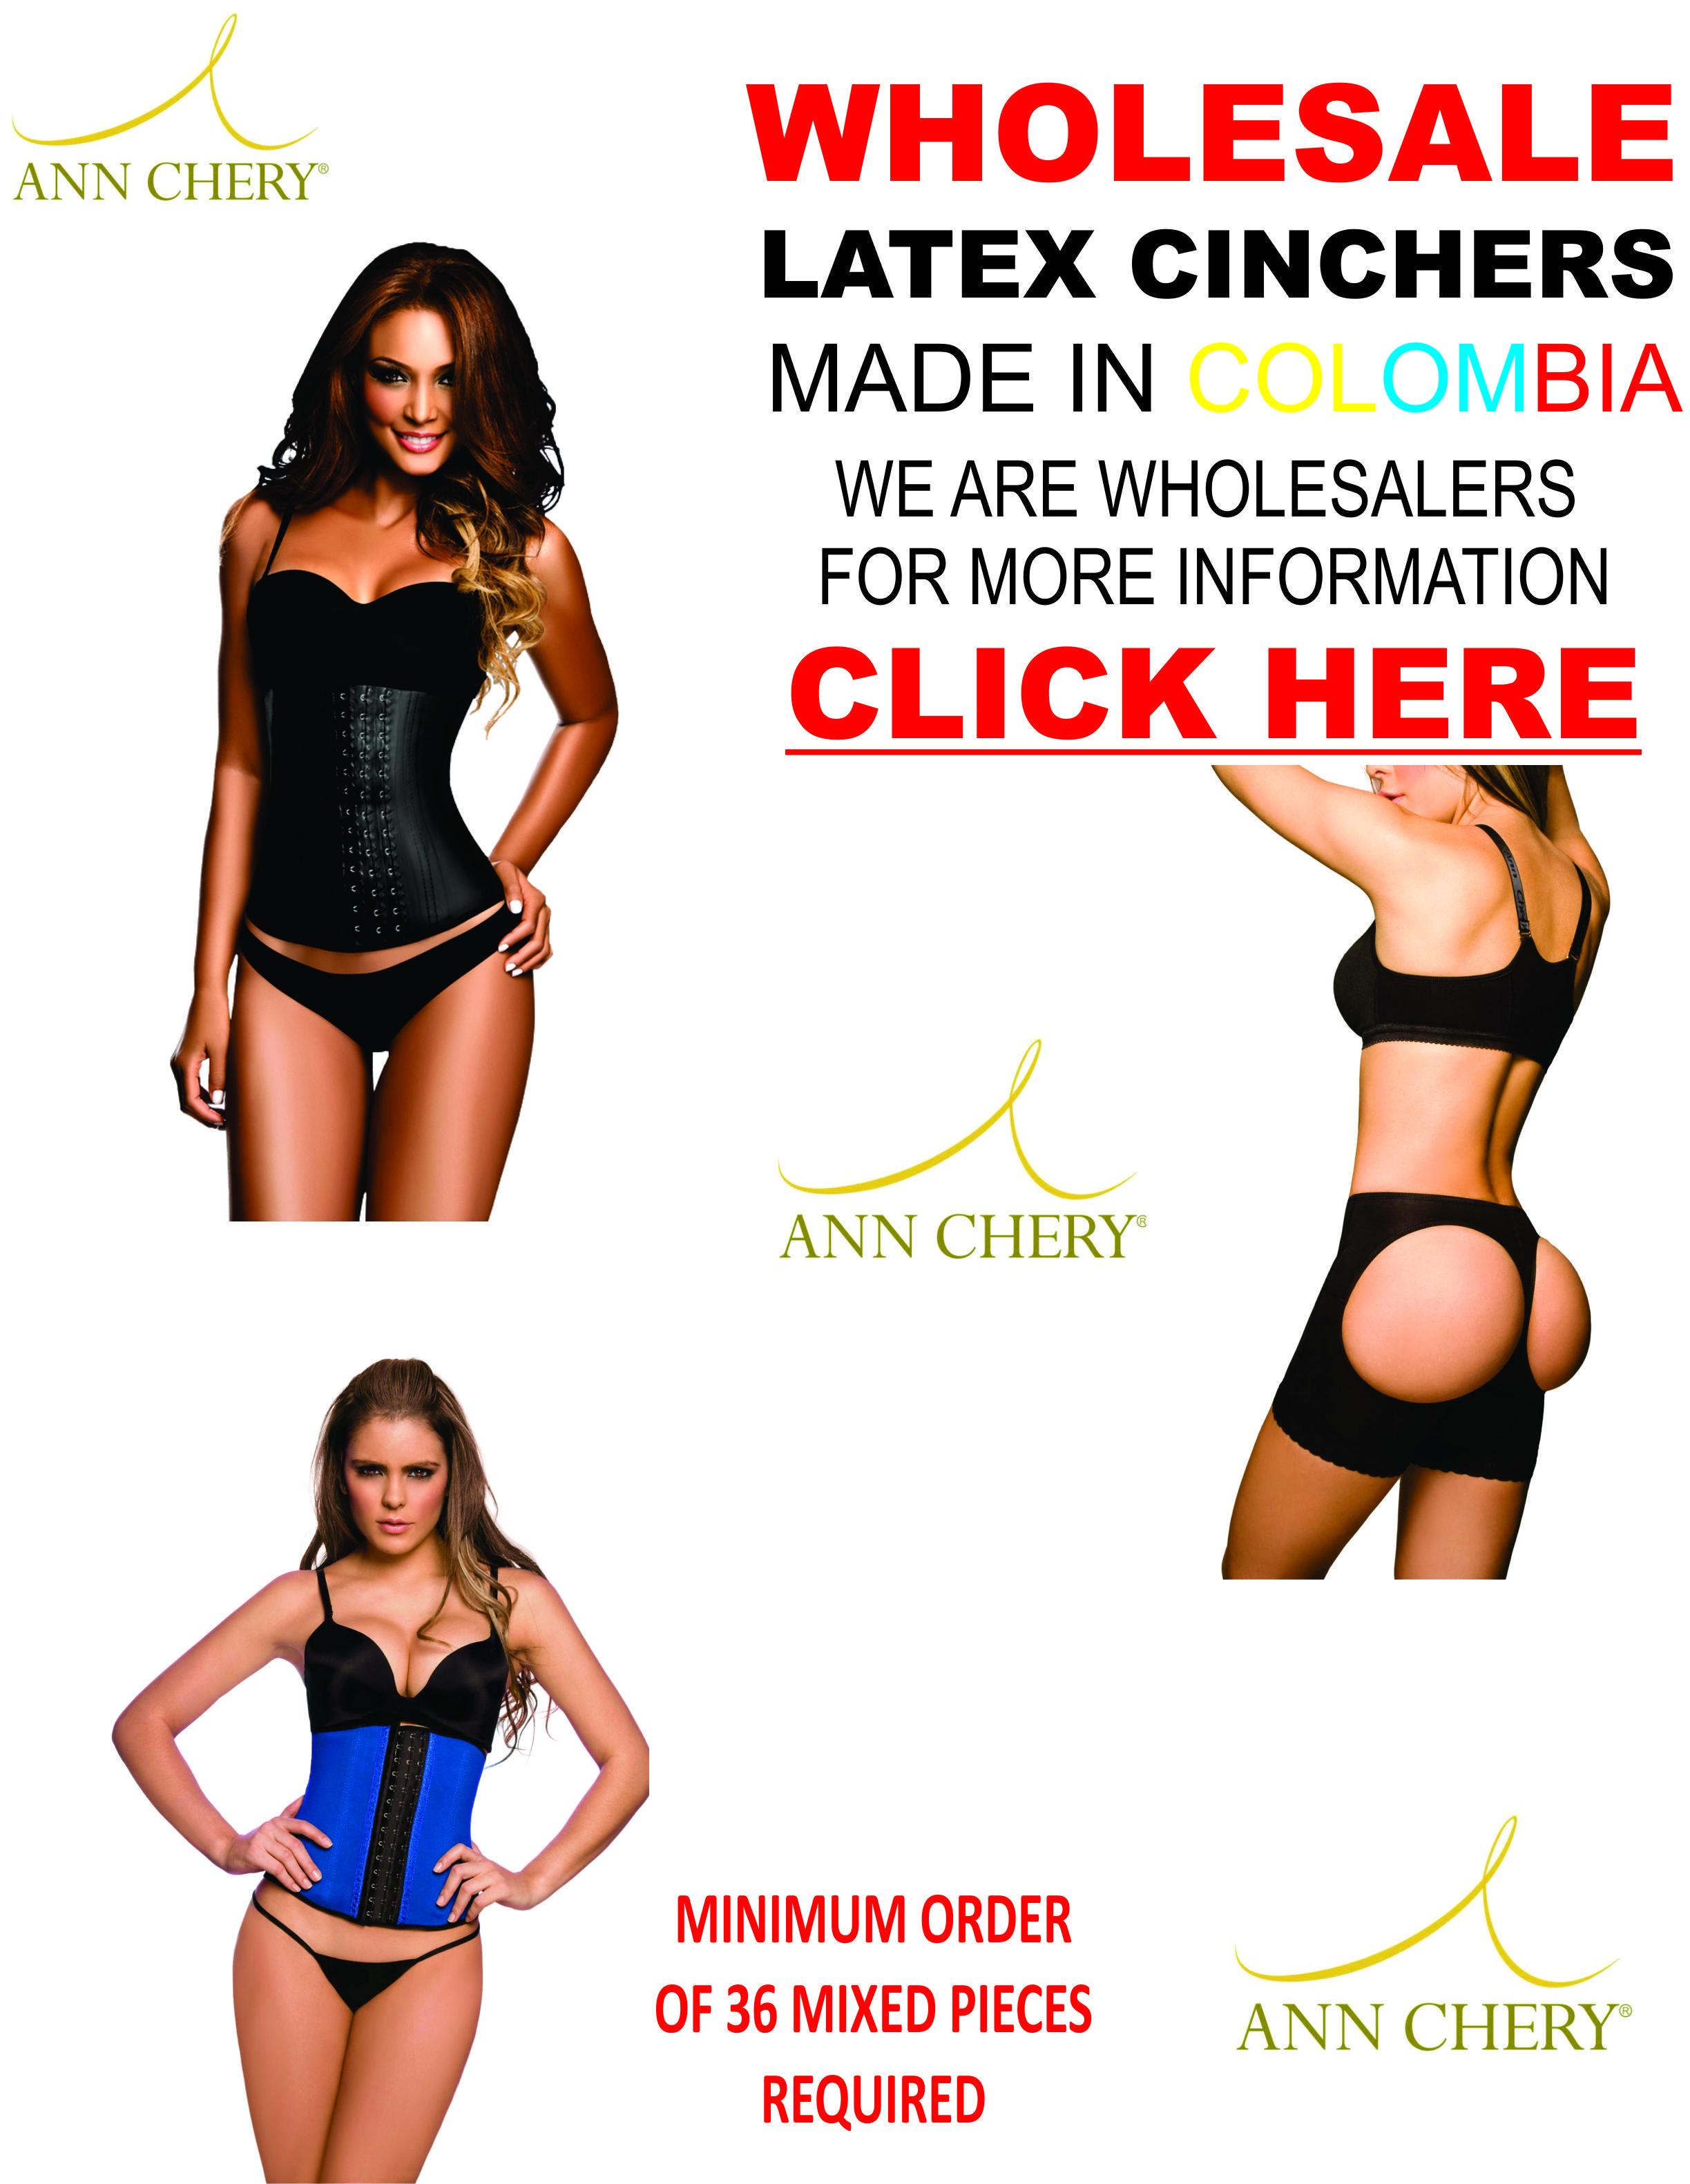 latex-cinchers-5-31-15.jpg